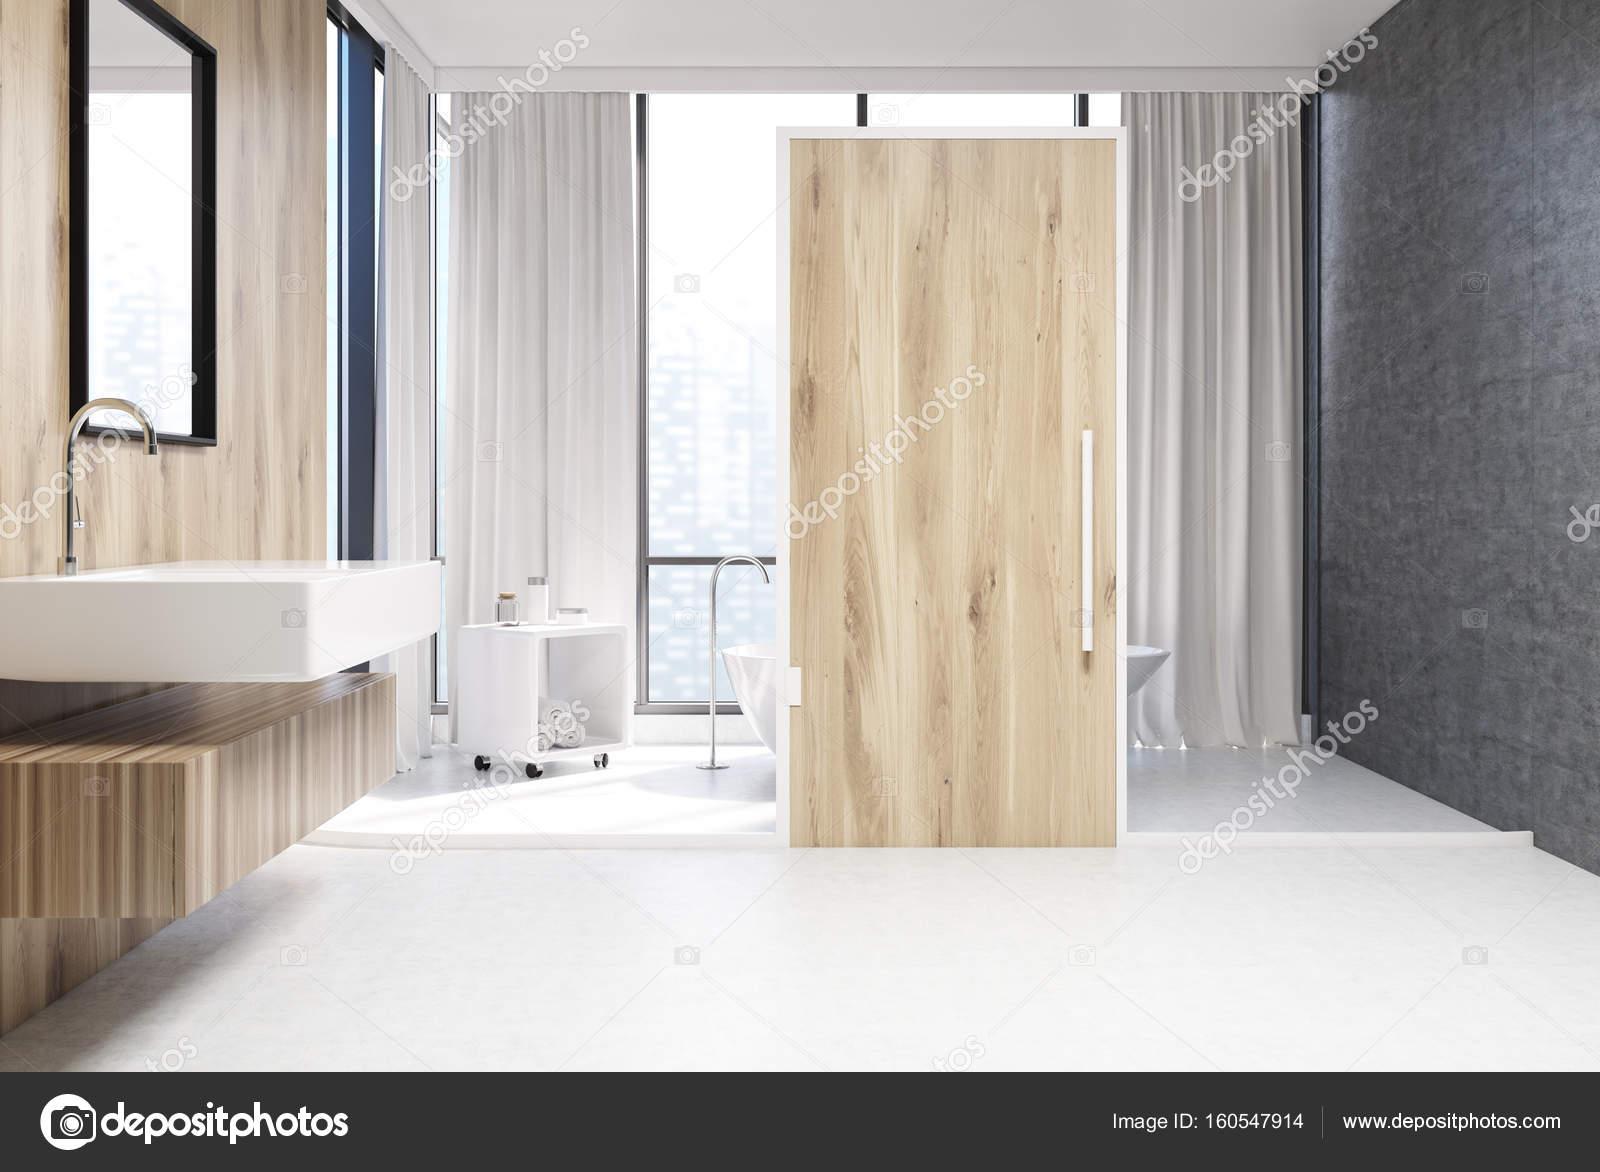 Ventilatie Badkamer Deur : Ventilatie badkamer deur: ventilatie rooster badkamer badkamer